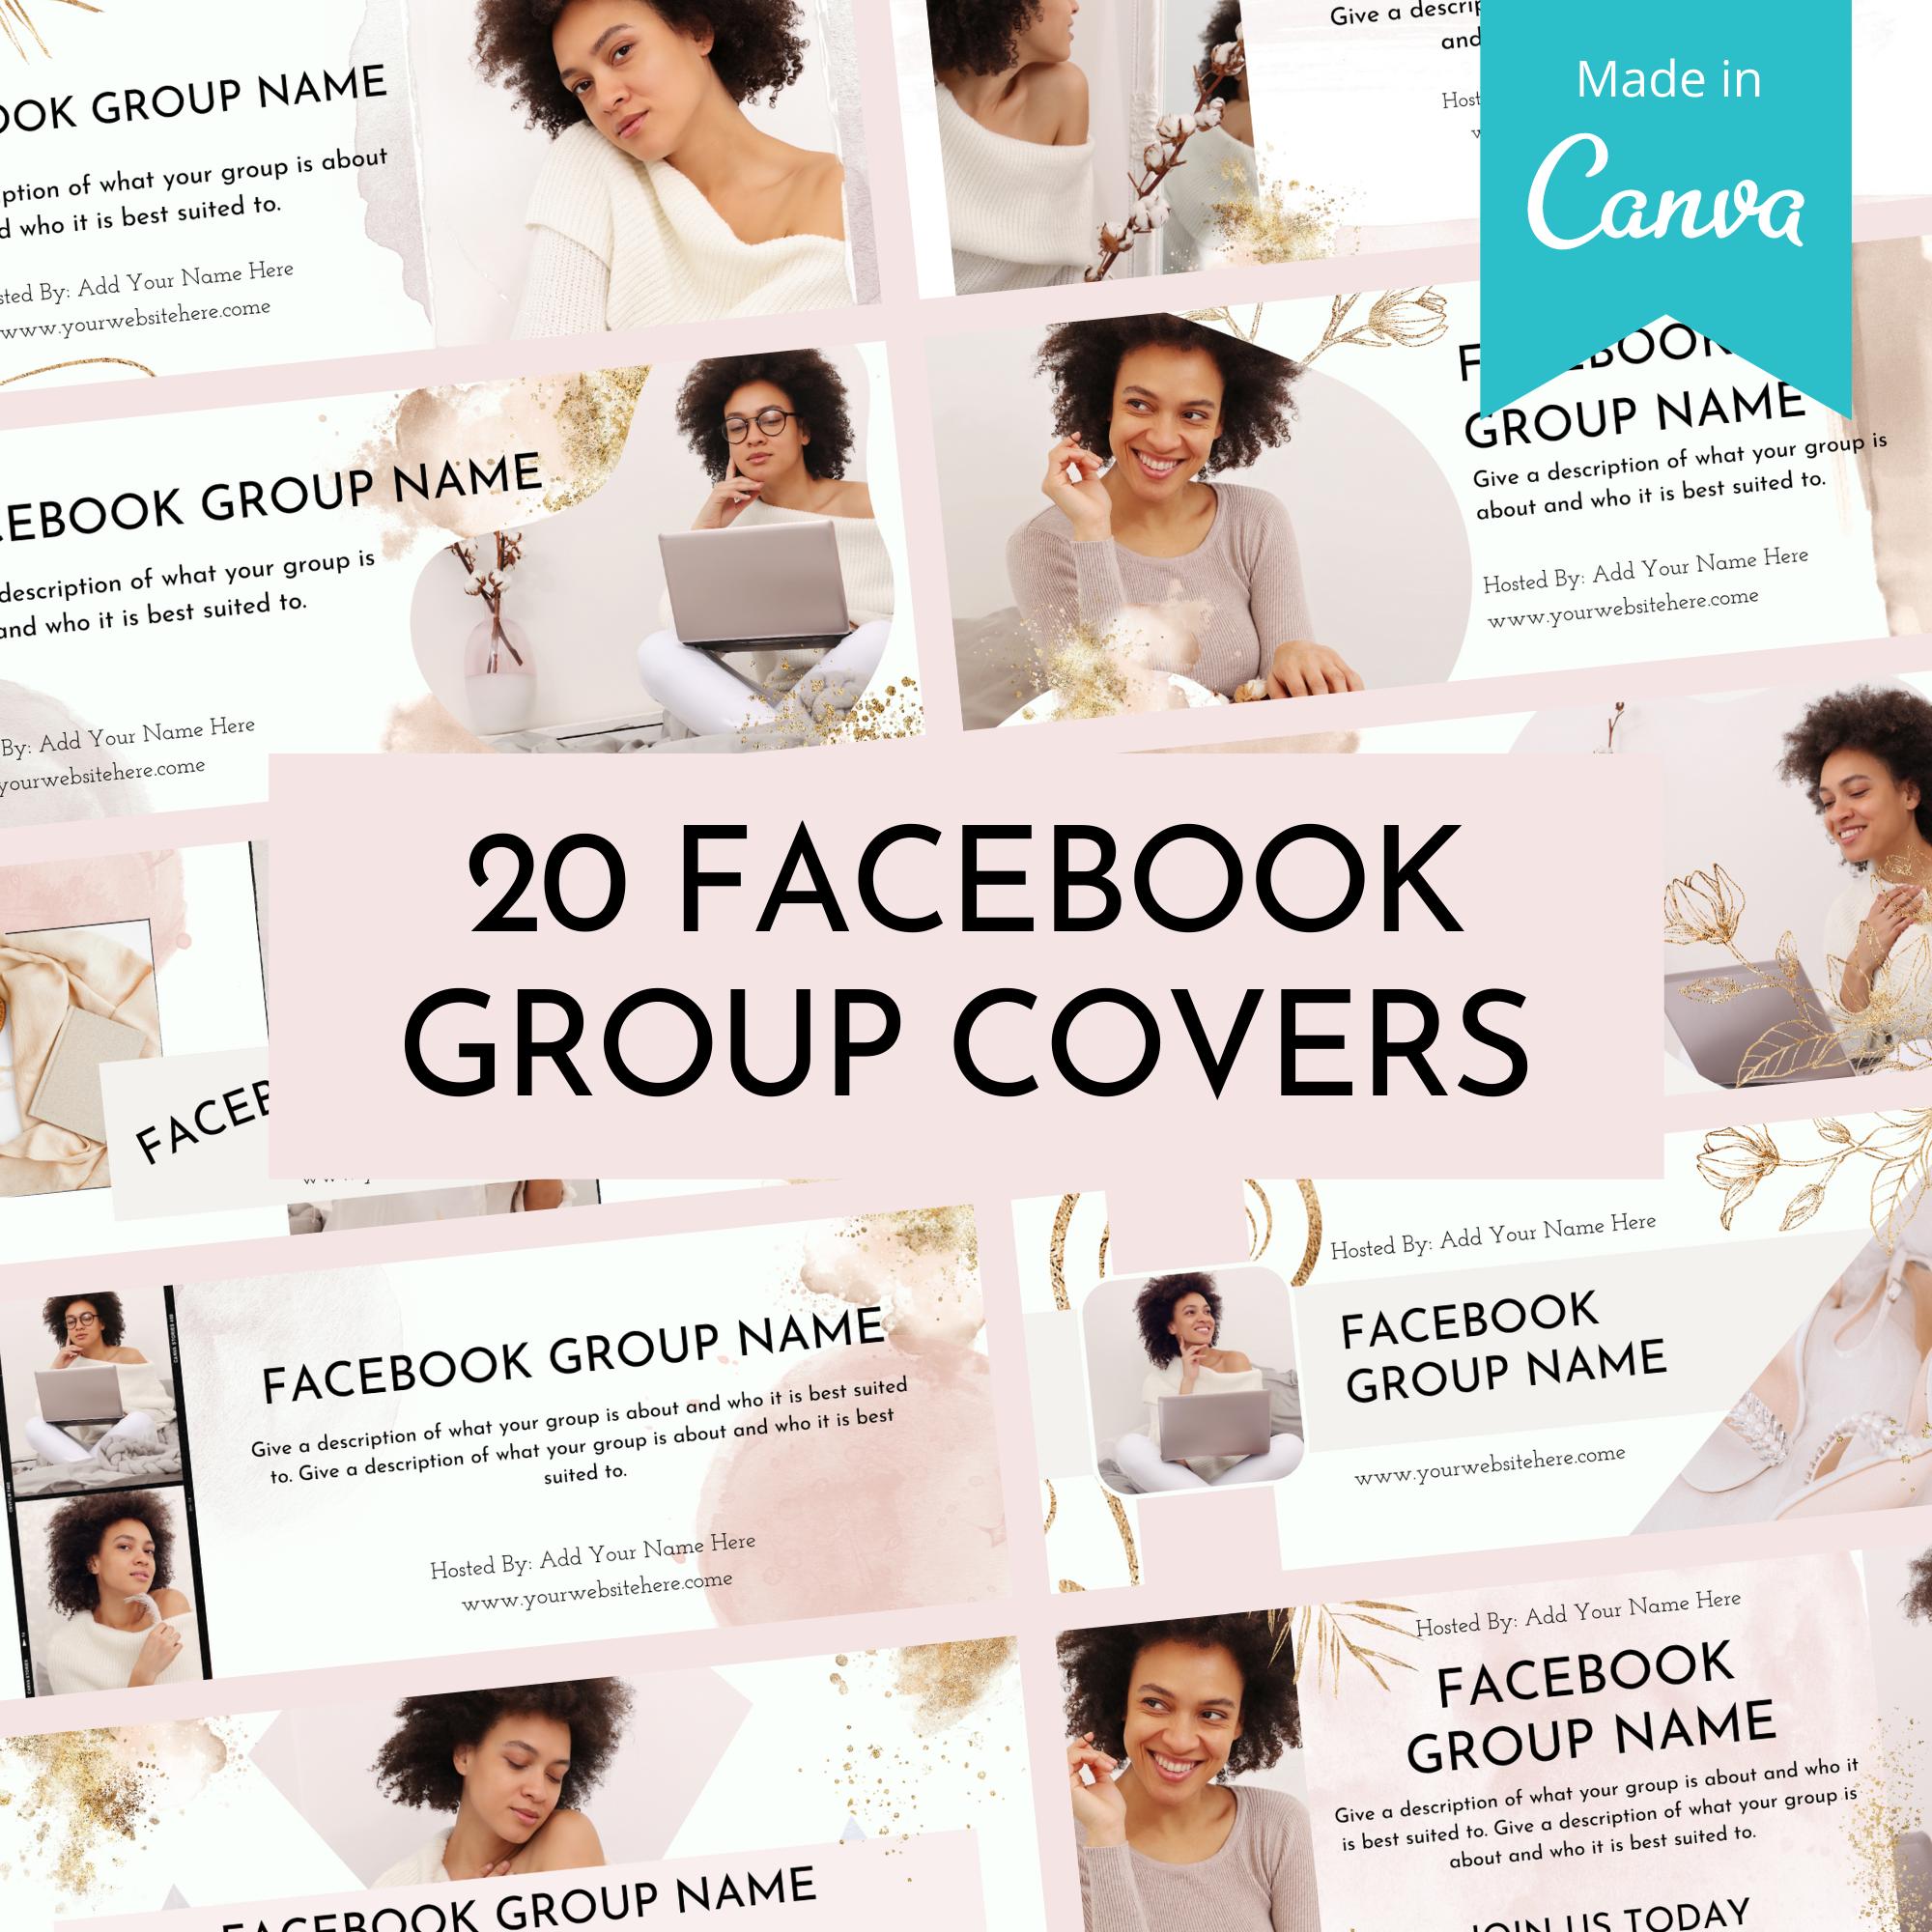 canva facebook templates